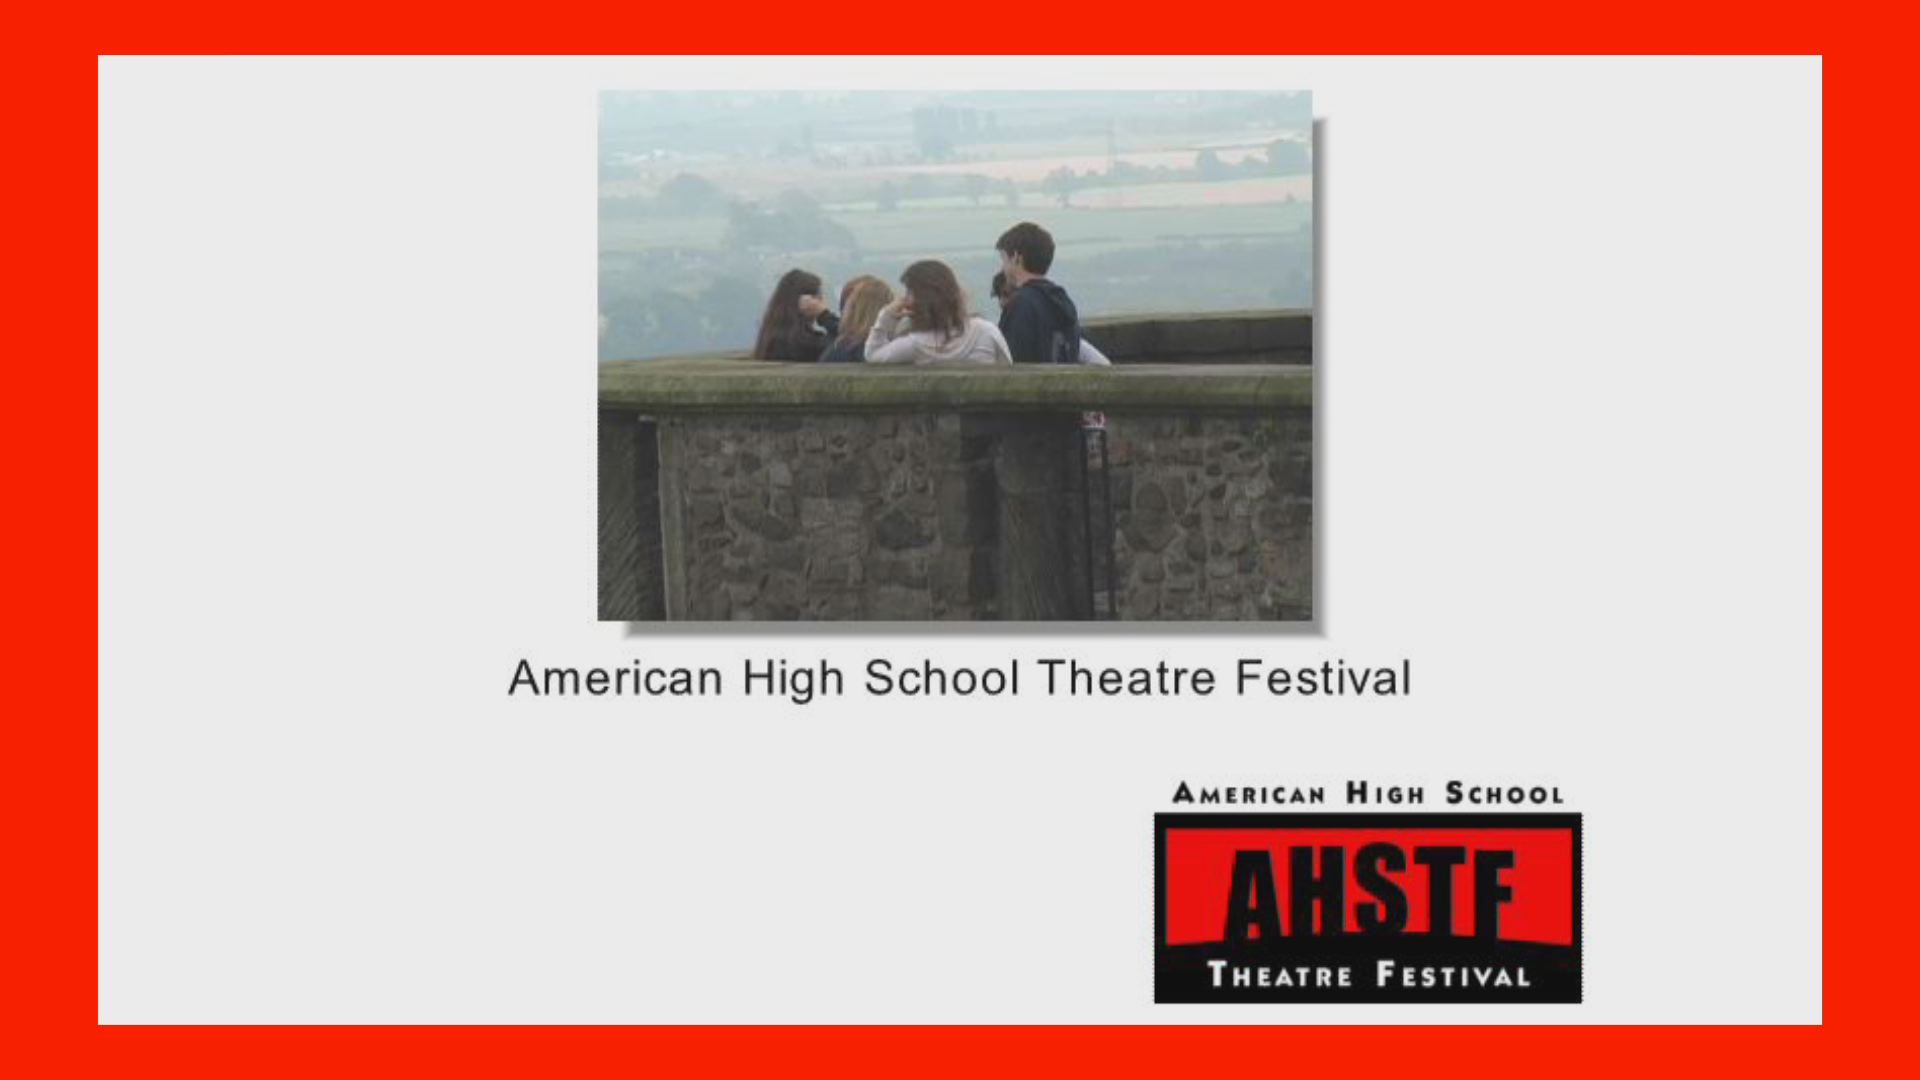 american high school theatre festival Video Production